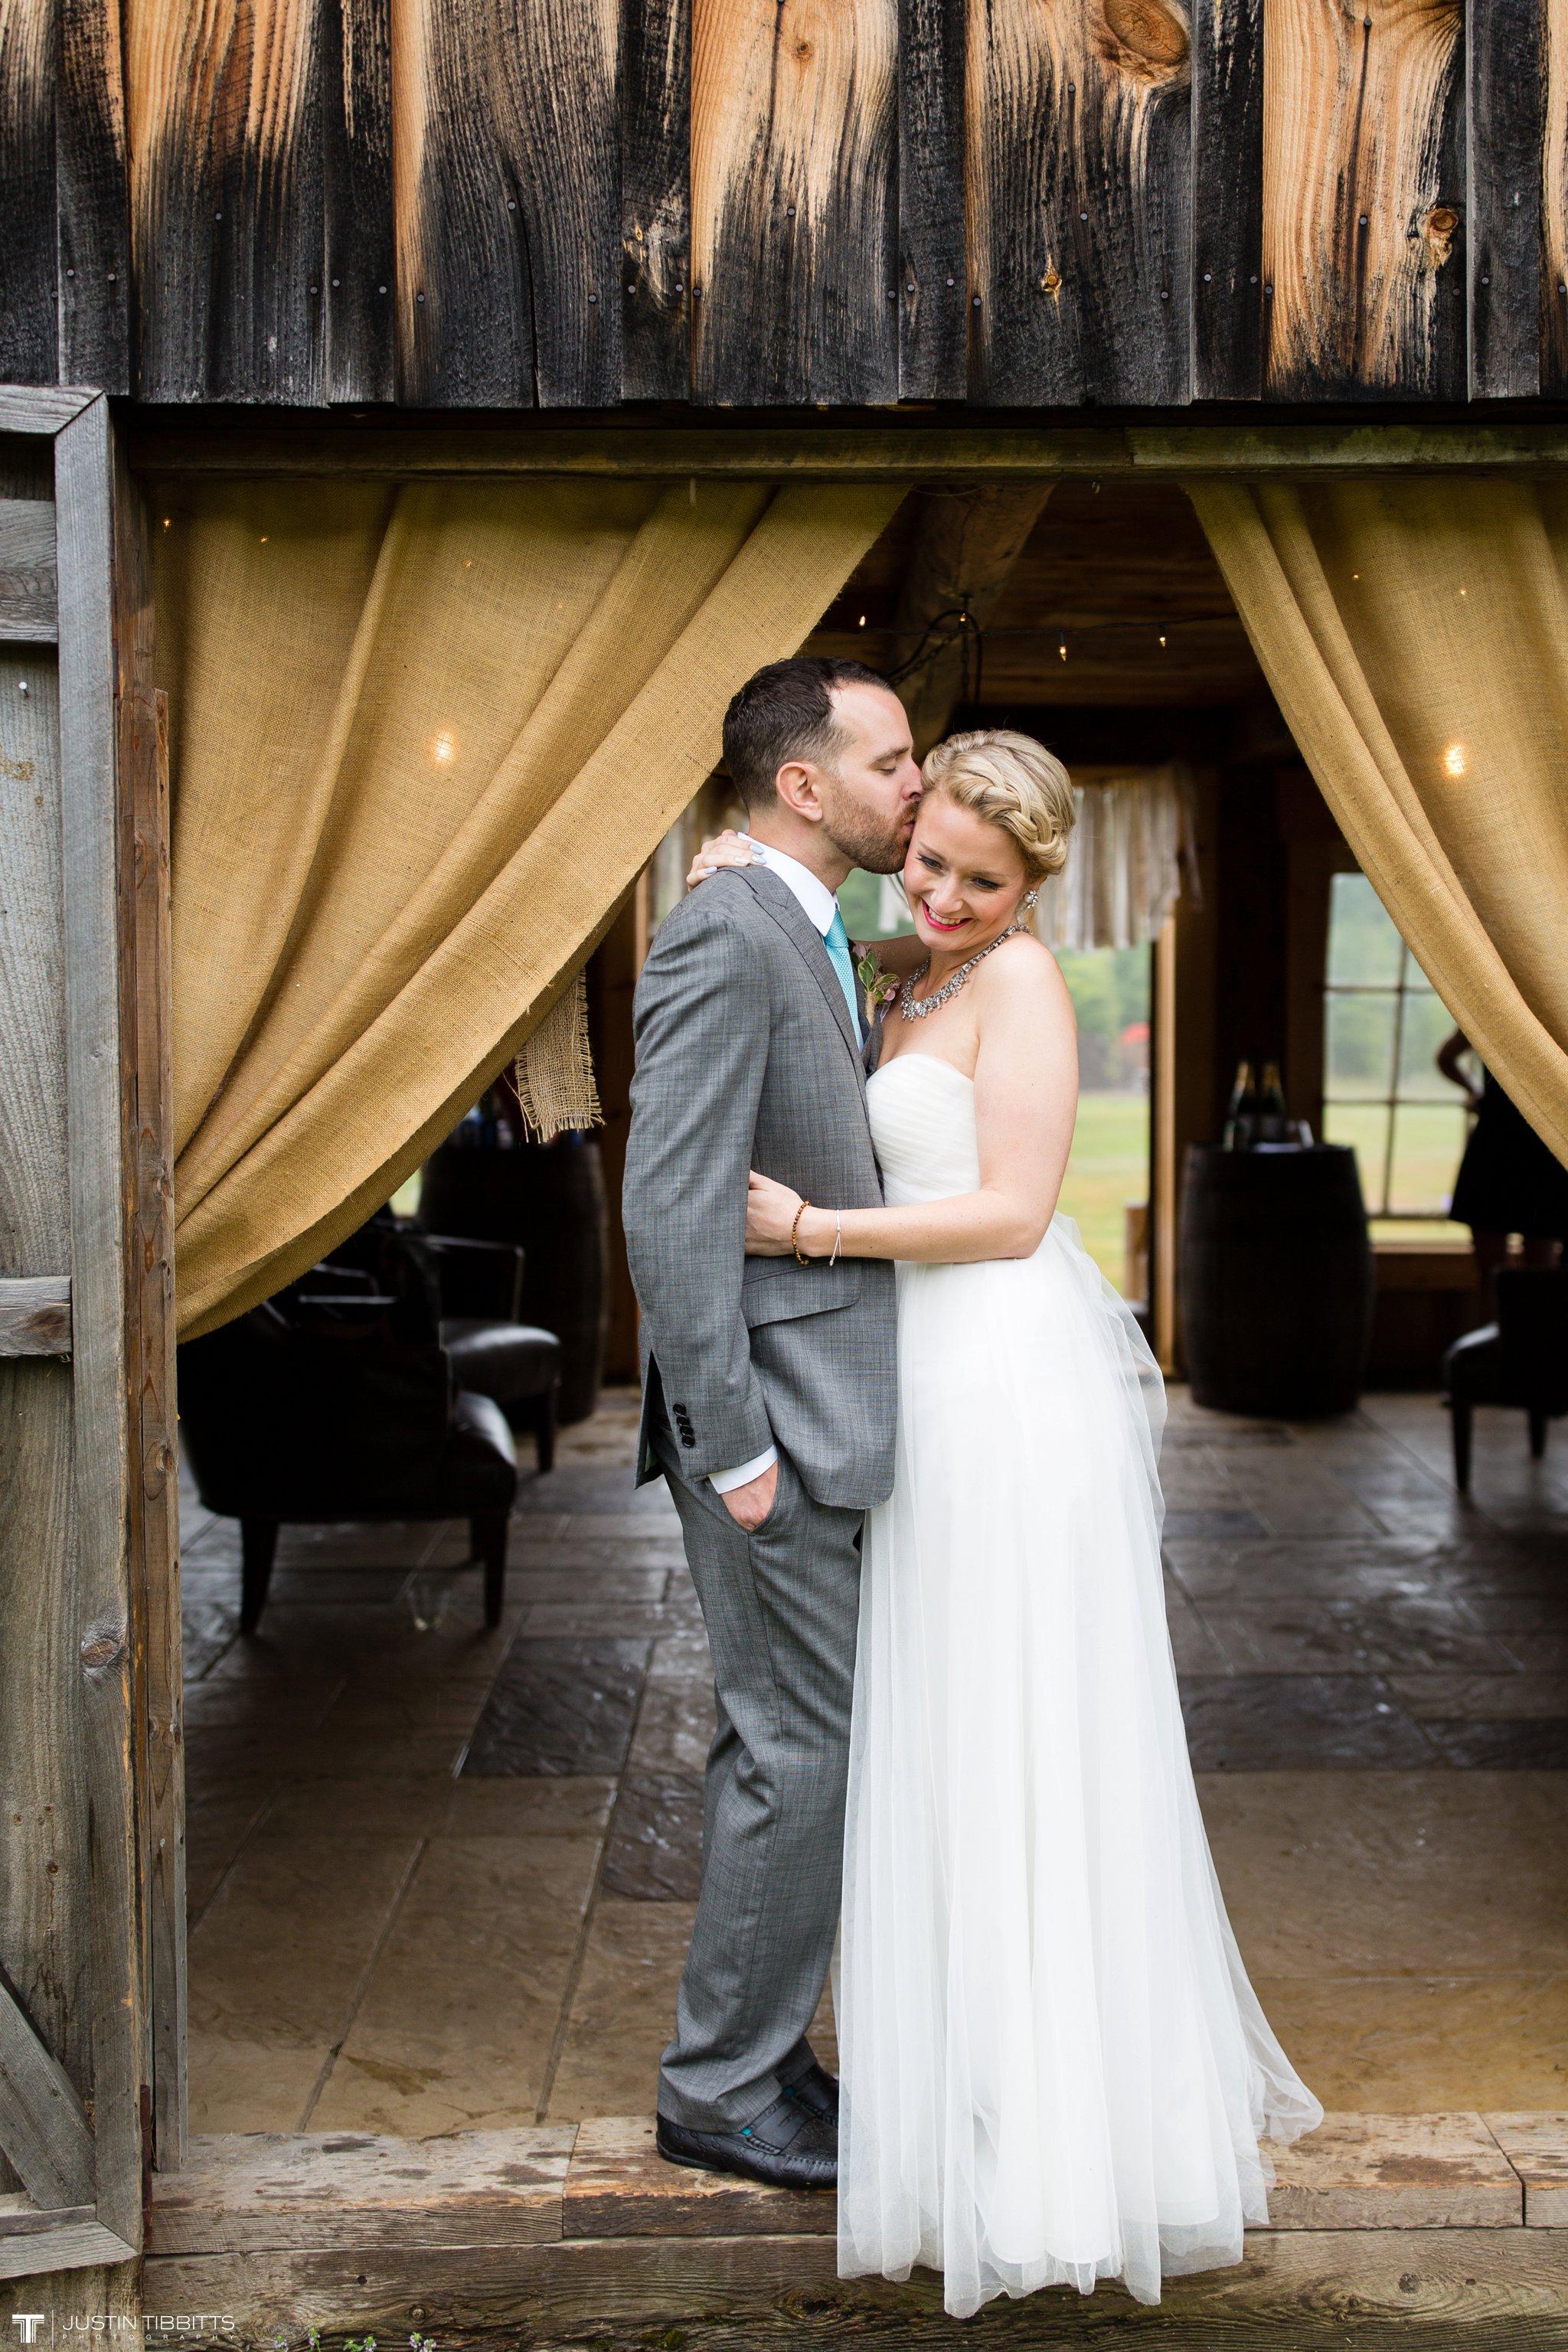 burlap-and-beams-wedding-photos-with-joran-and-molly_0086